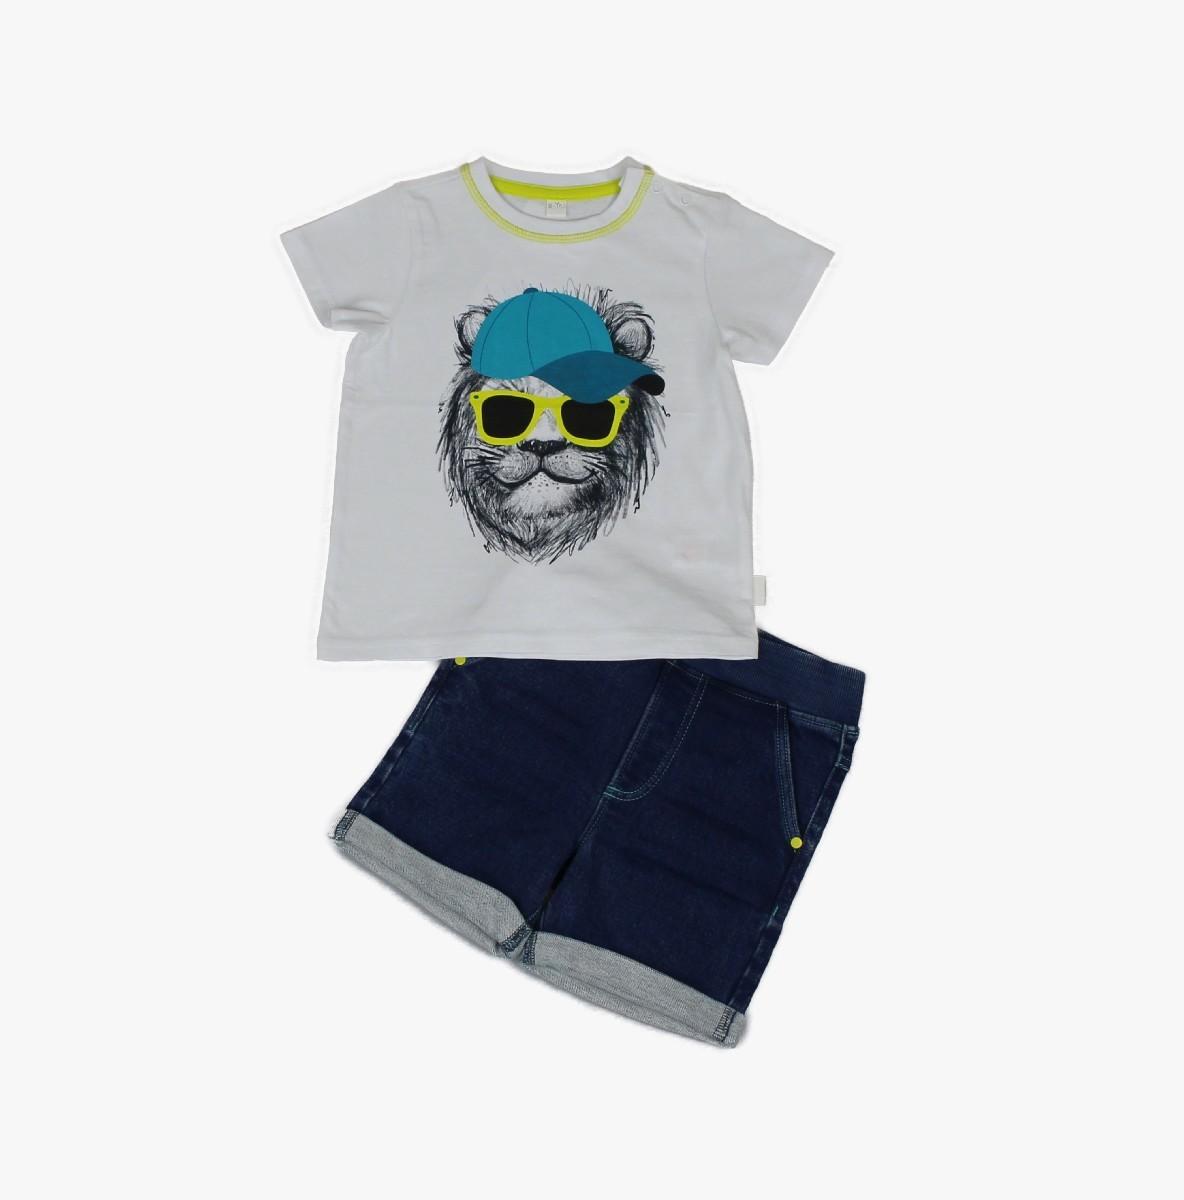 Denim Short + T-shirt, Lion